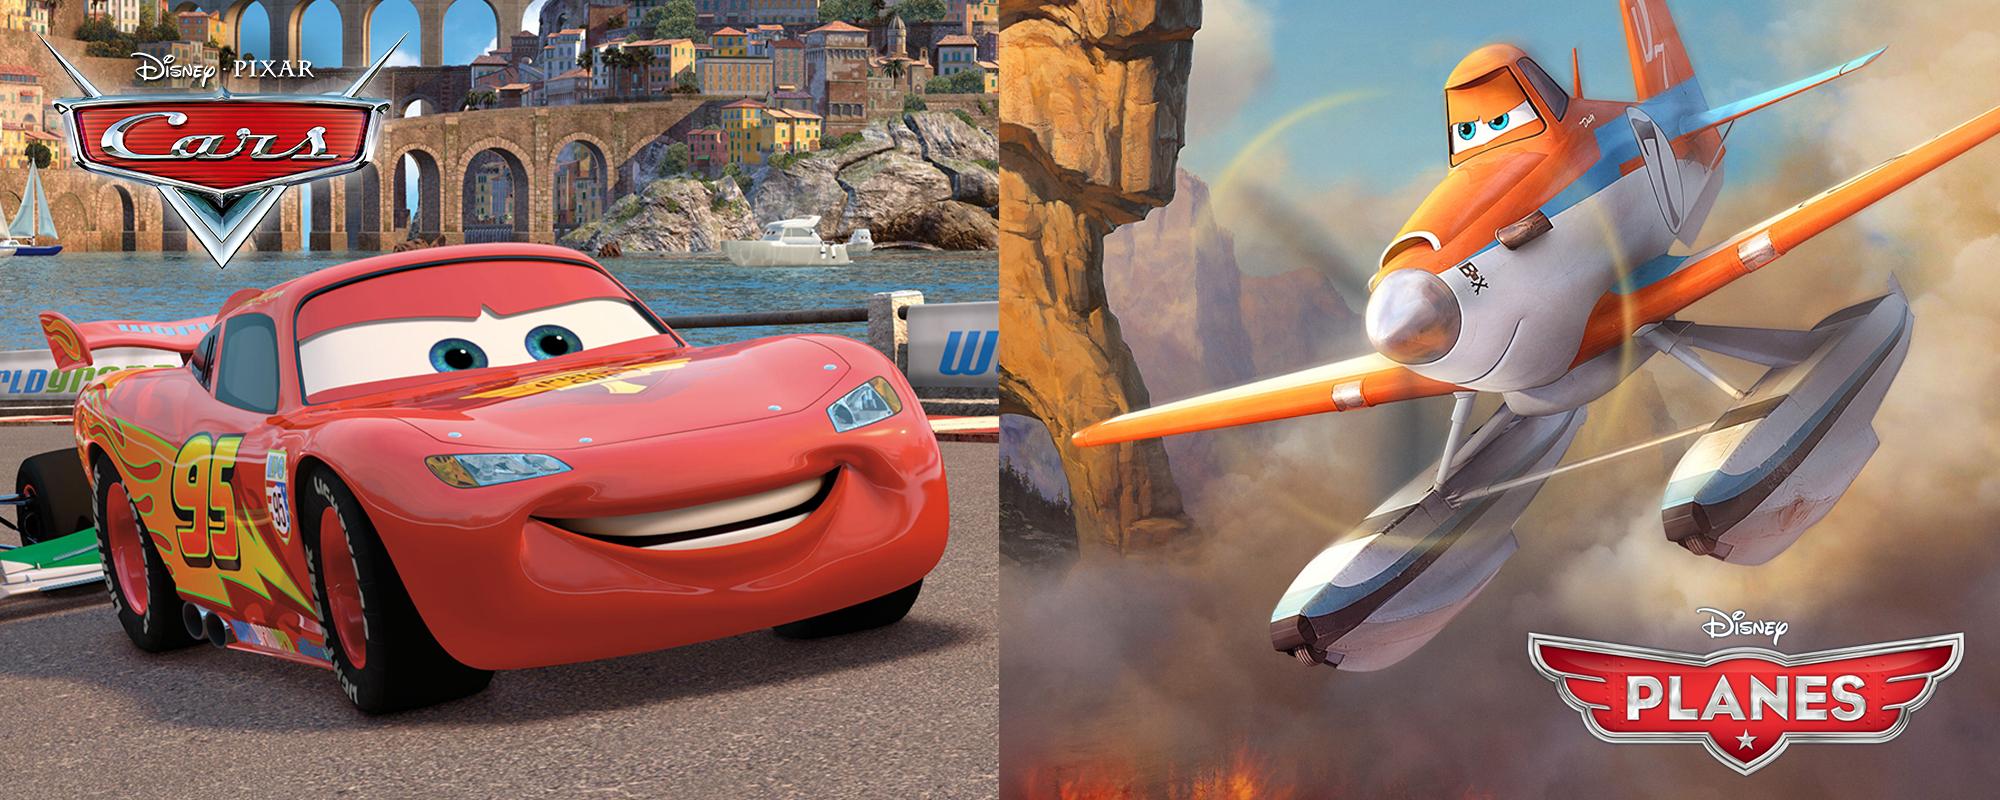 Disney Cars & Disney Planes